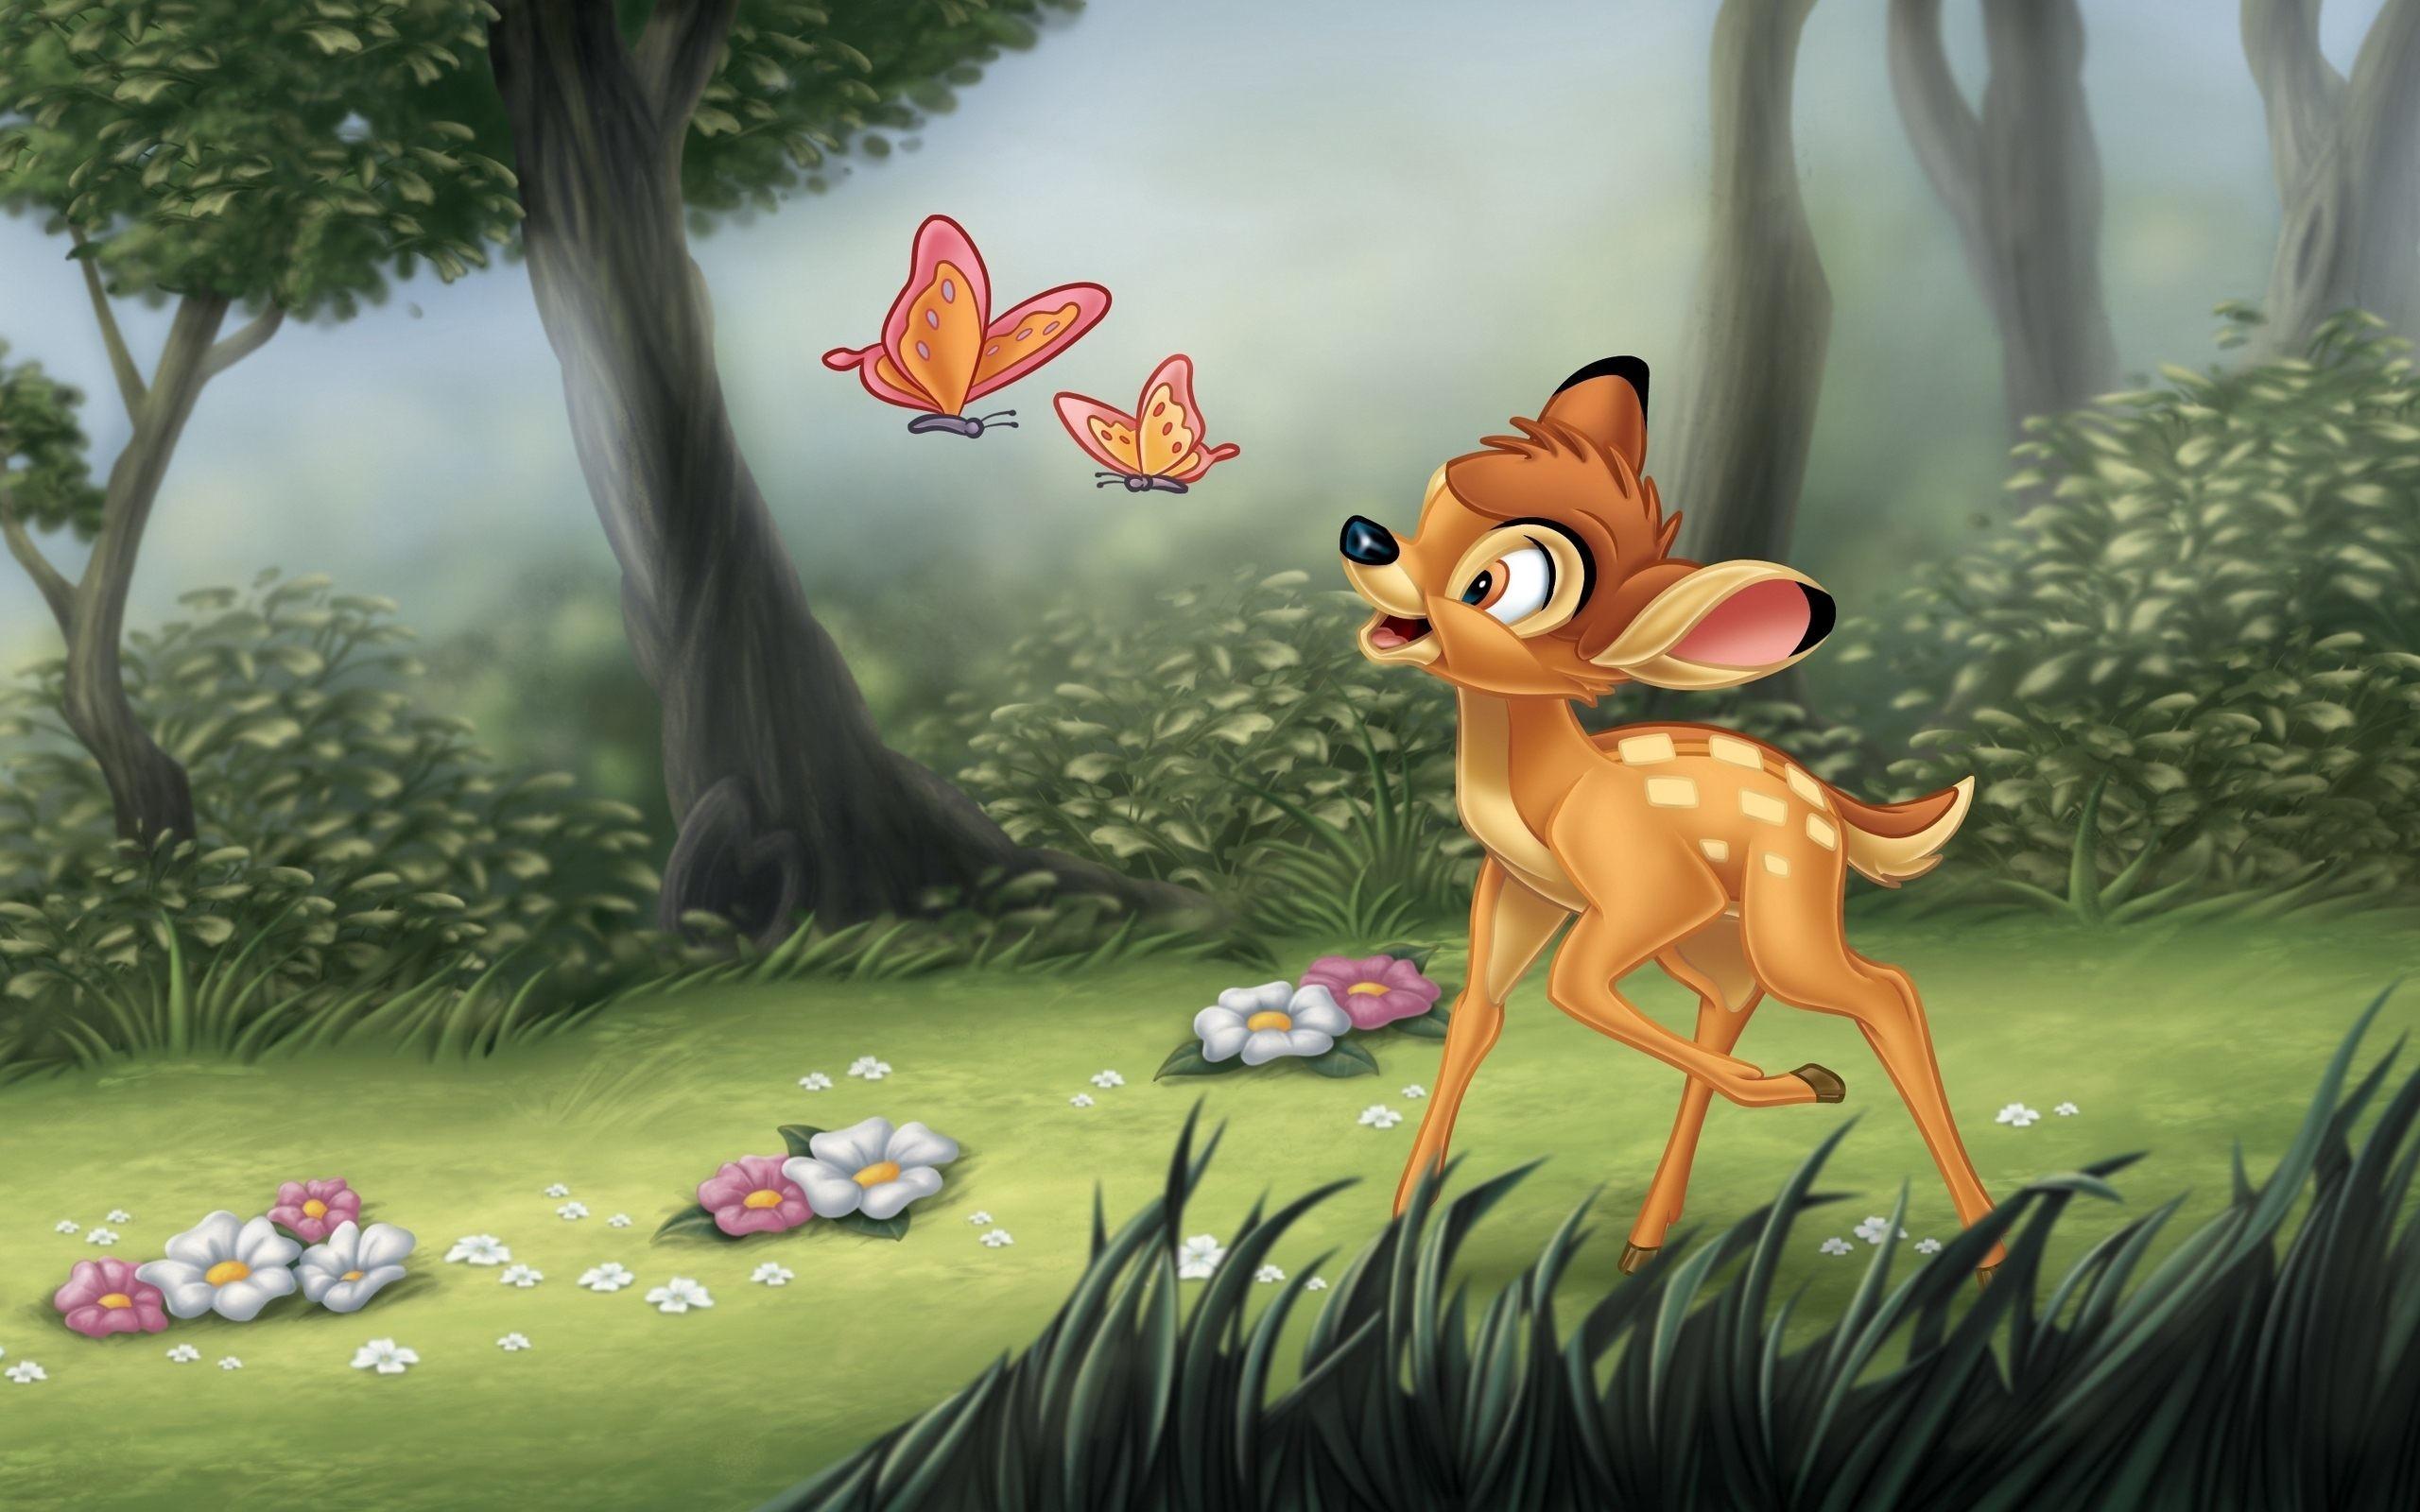 Disney Bambi Movie Wallpaper